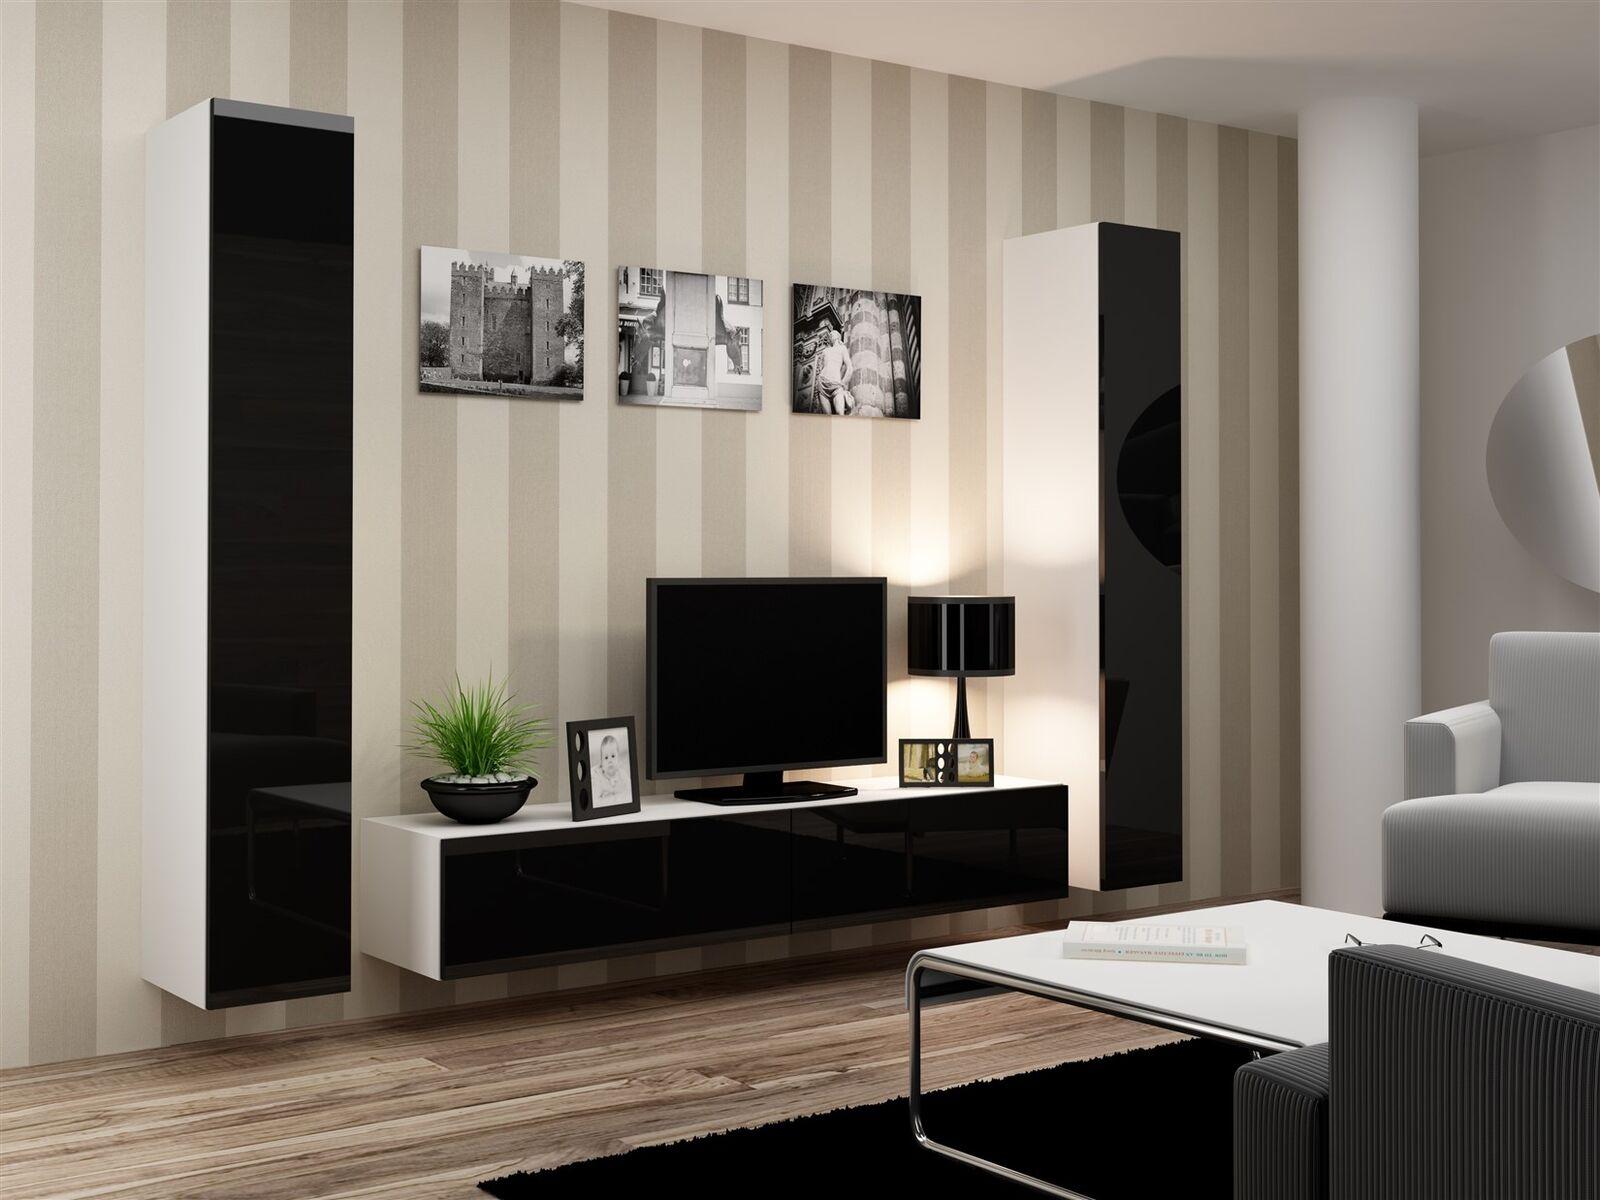 Mediawand wohnwand 3 3 3 pces-sentic 16-Blanc/Noir Brillant 3bf258